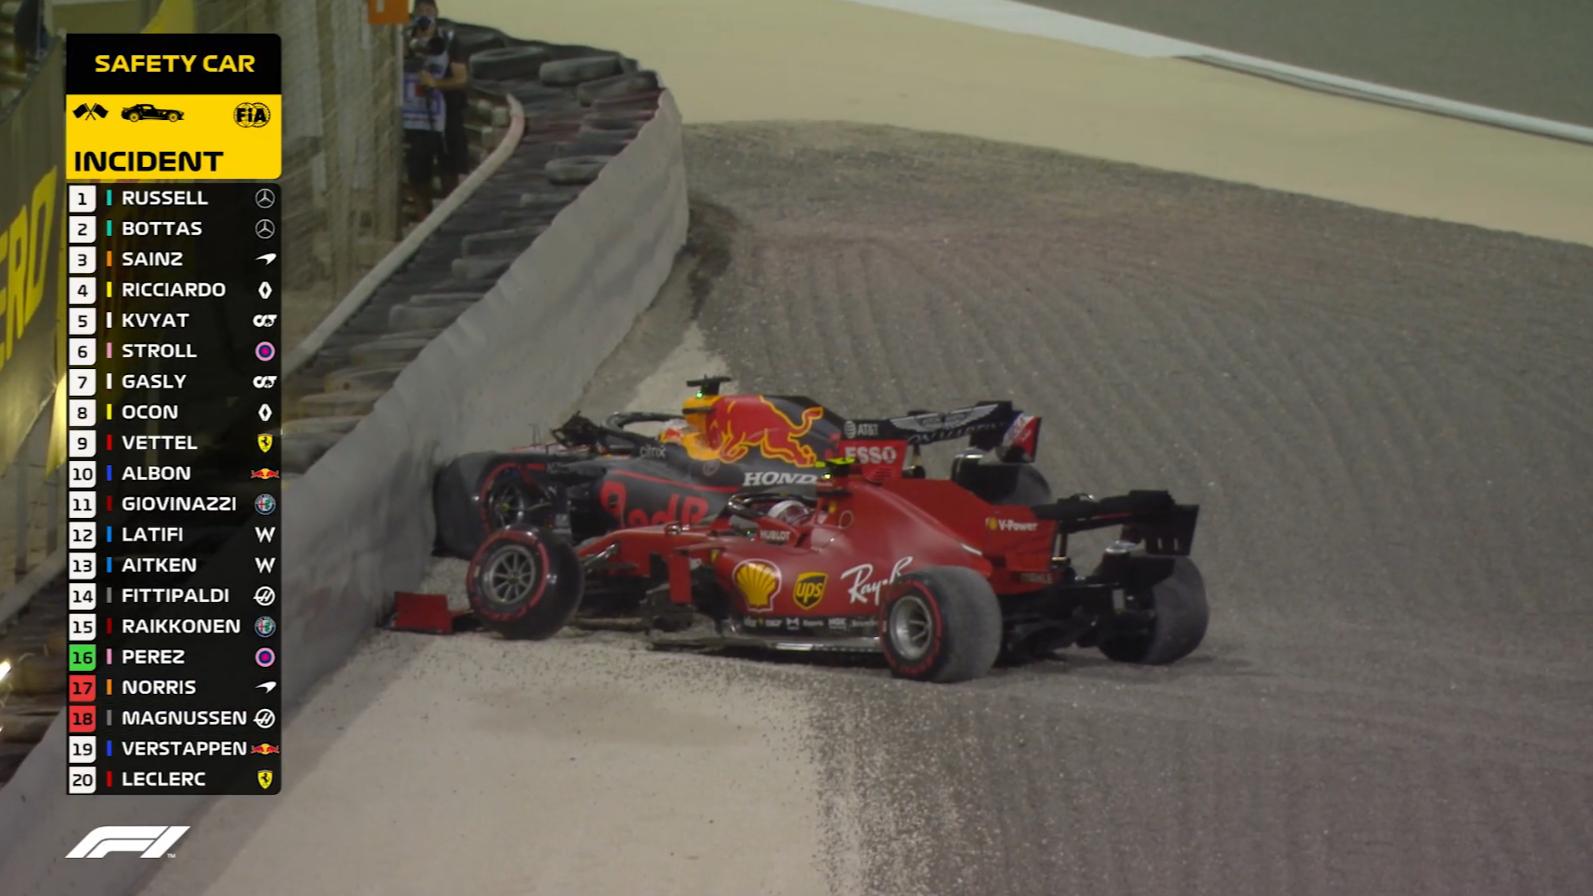 F1 2020巴林R2正赛,佩雷斯生涯首冠,梅塞德斯换错轮胎丢掉领奖台,勒克莱尔撞车连累维斯塔潘双退